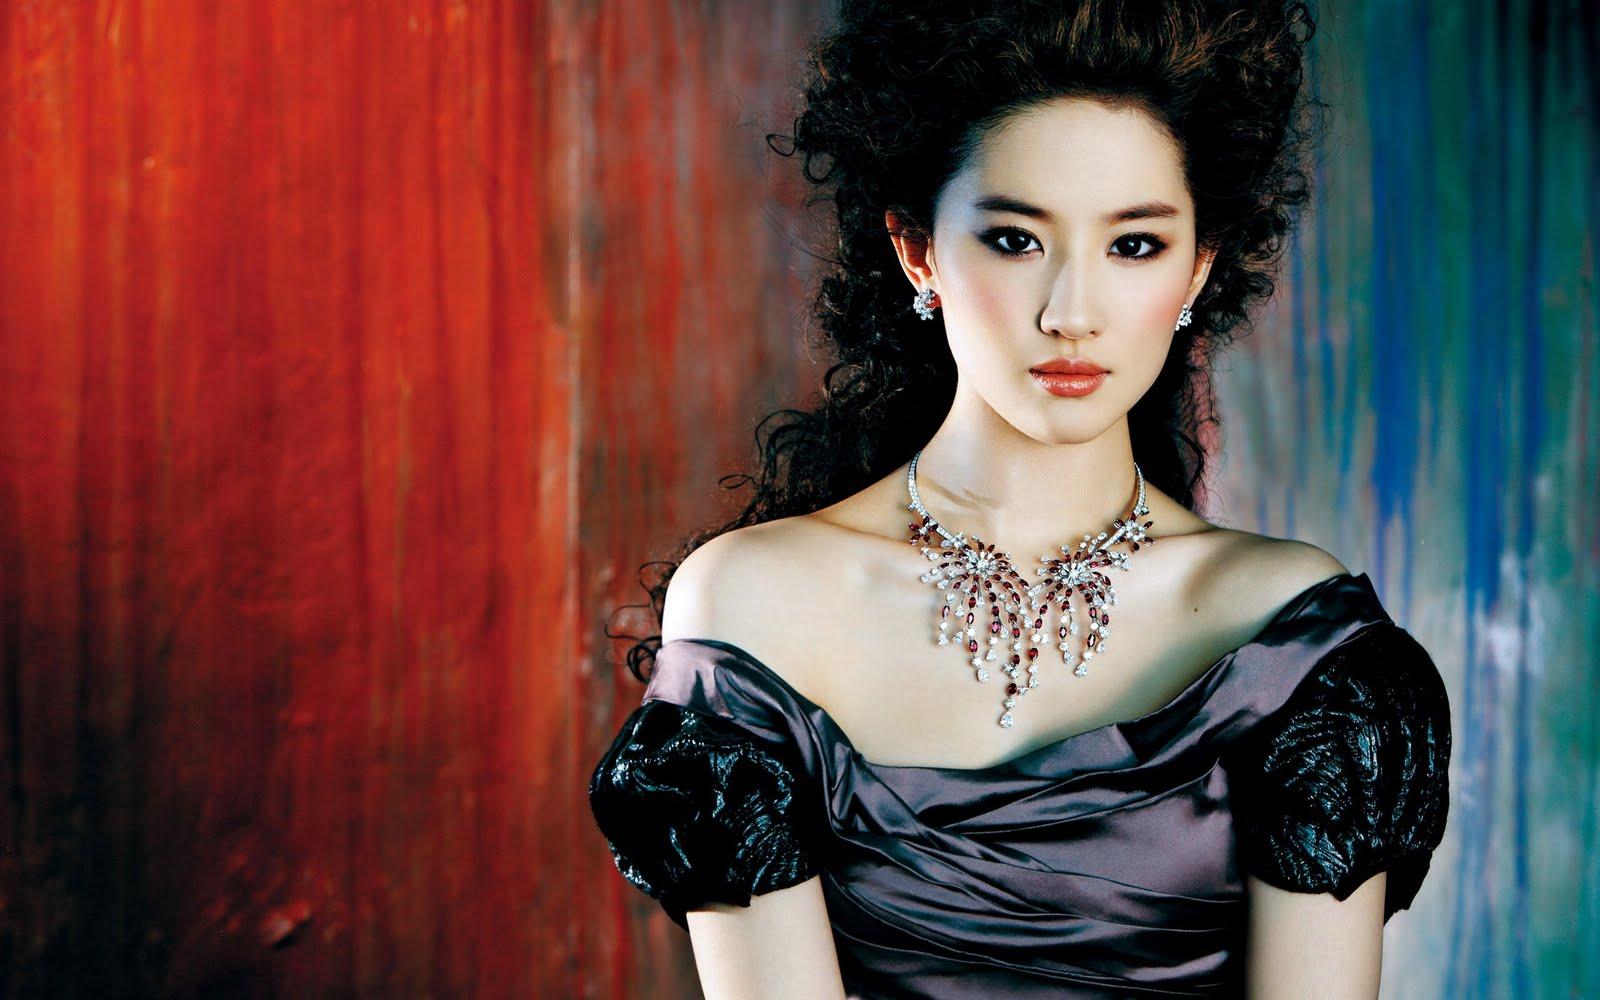 http://4.bp.blogspot.com/-GC0TAgzYQrk/TmA0dprMx2I/AAAAAAAABv0/iX2-1w1nePw/s1600/liu_yifei_chinese_actress-wide.jpg